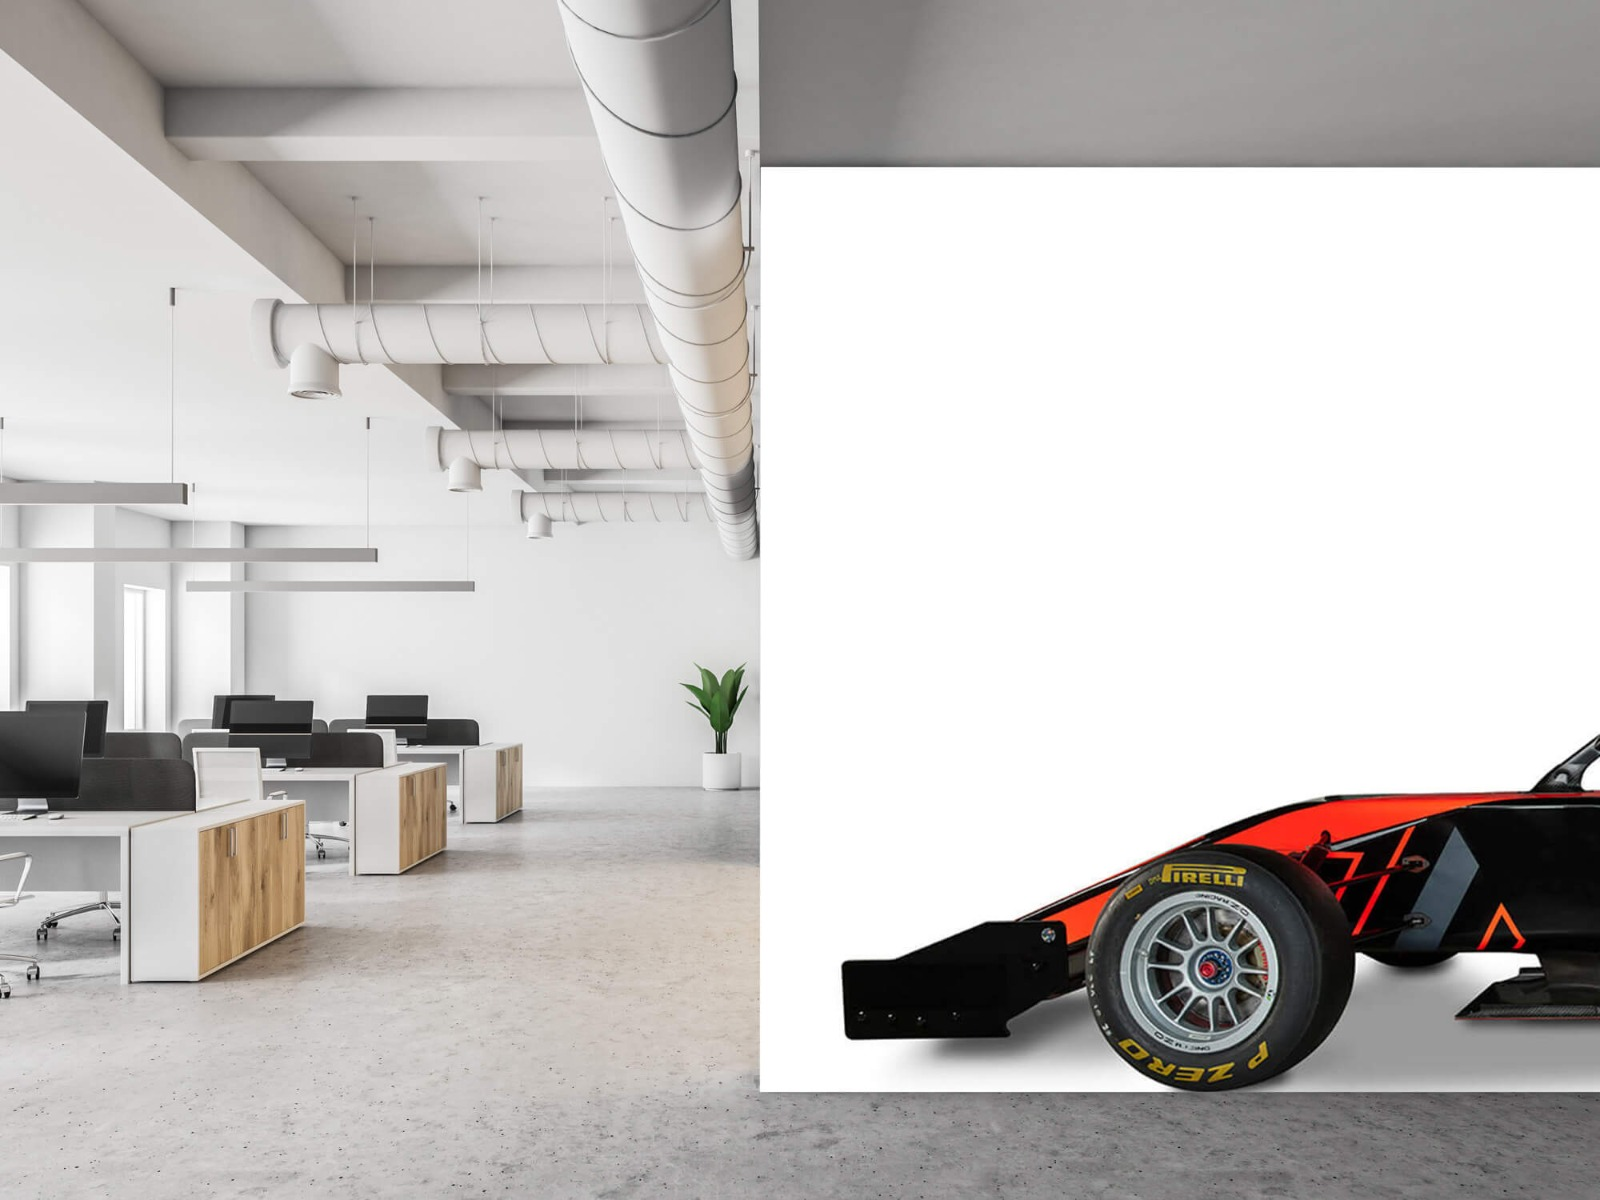 Sportauto's - Formule 3 - Lower side view - Computerruimte 21